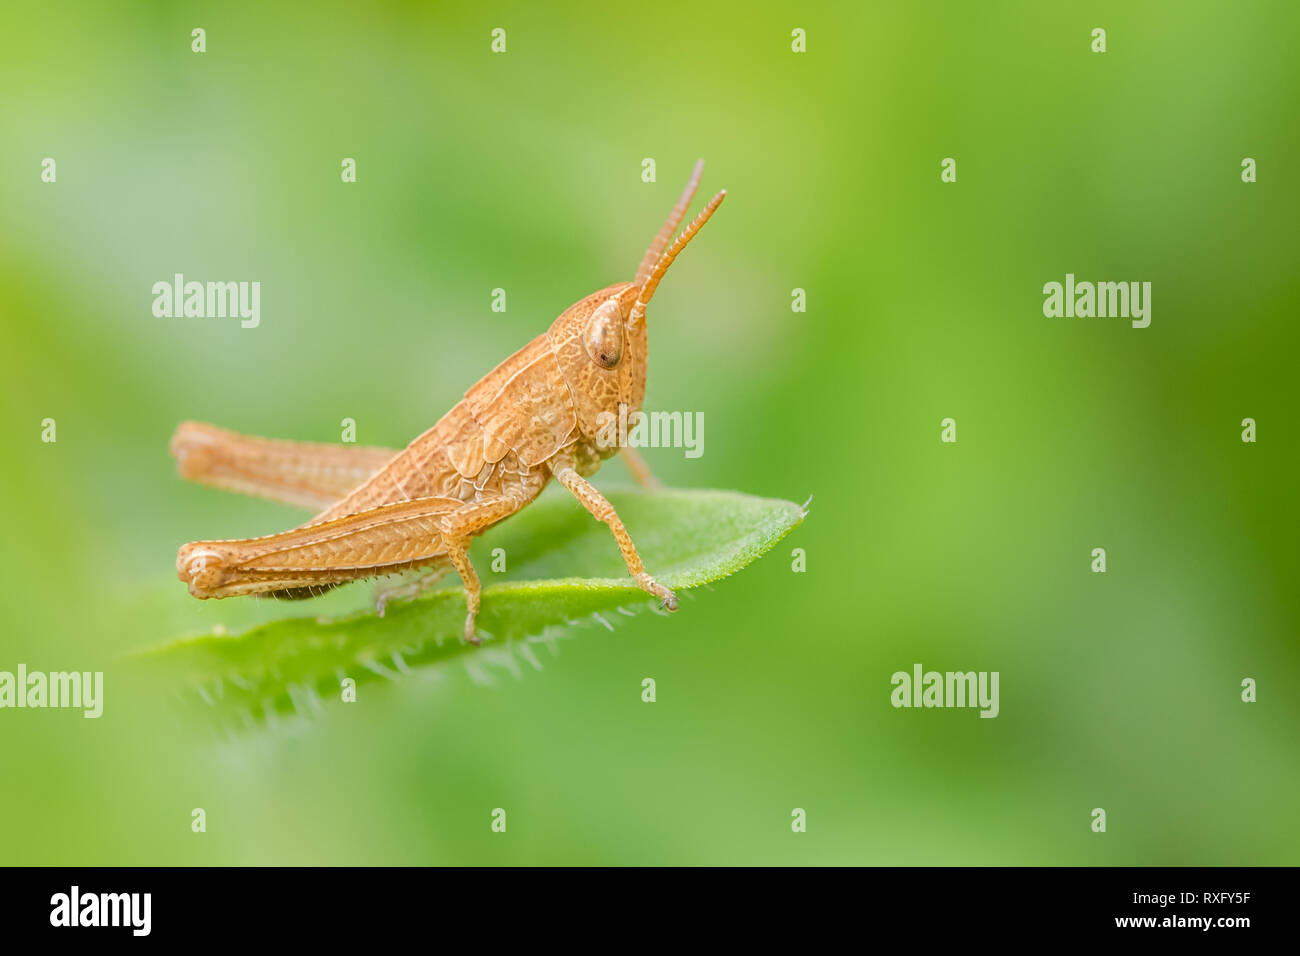 Grashüpfer auf einem Blatt - Stock Image